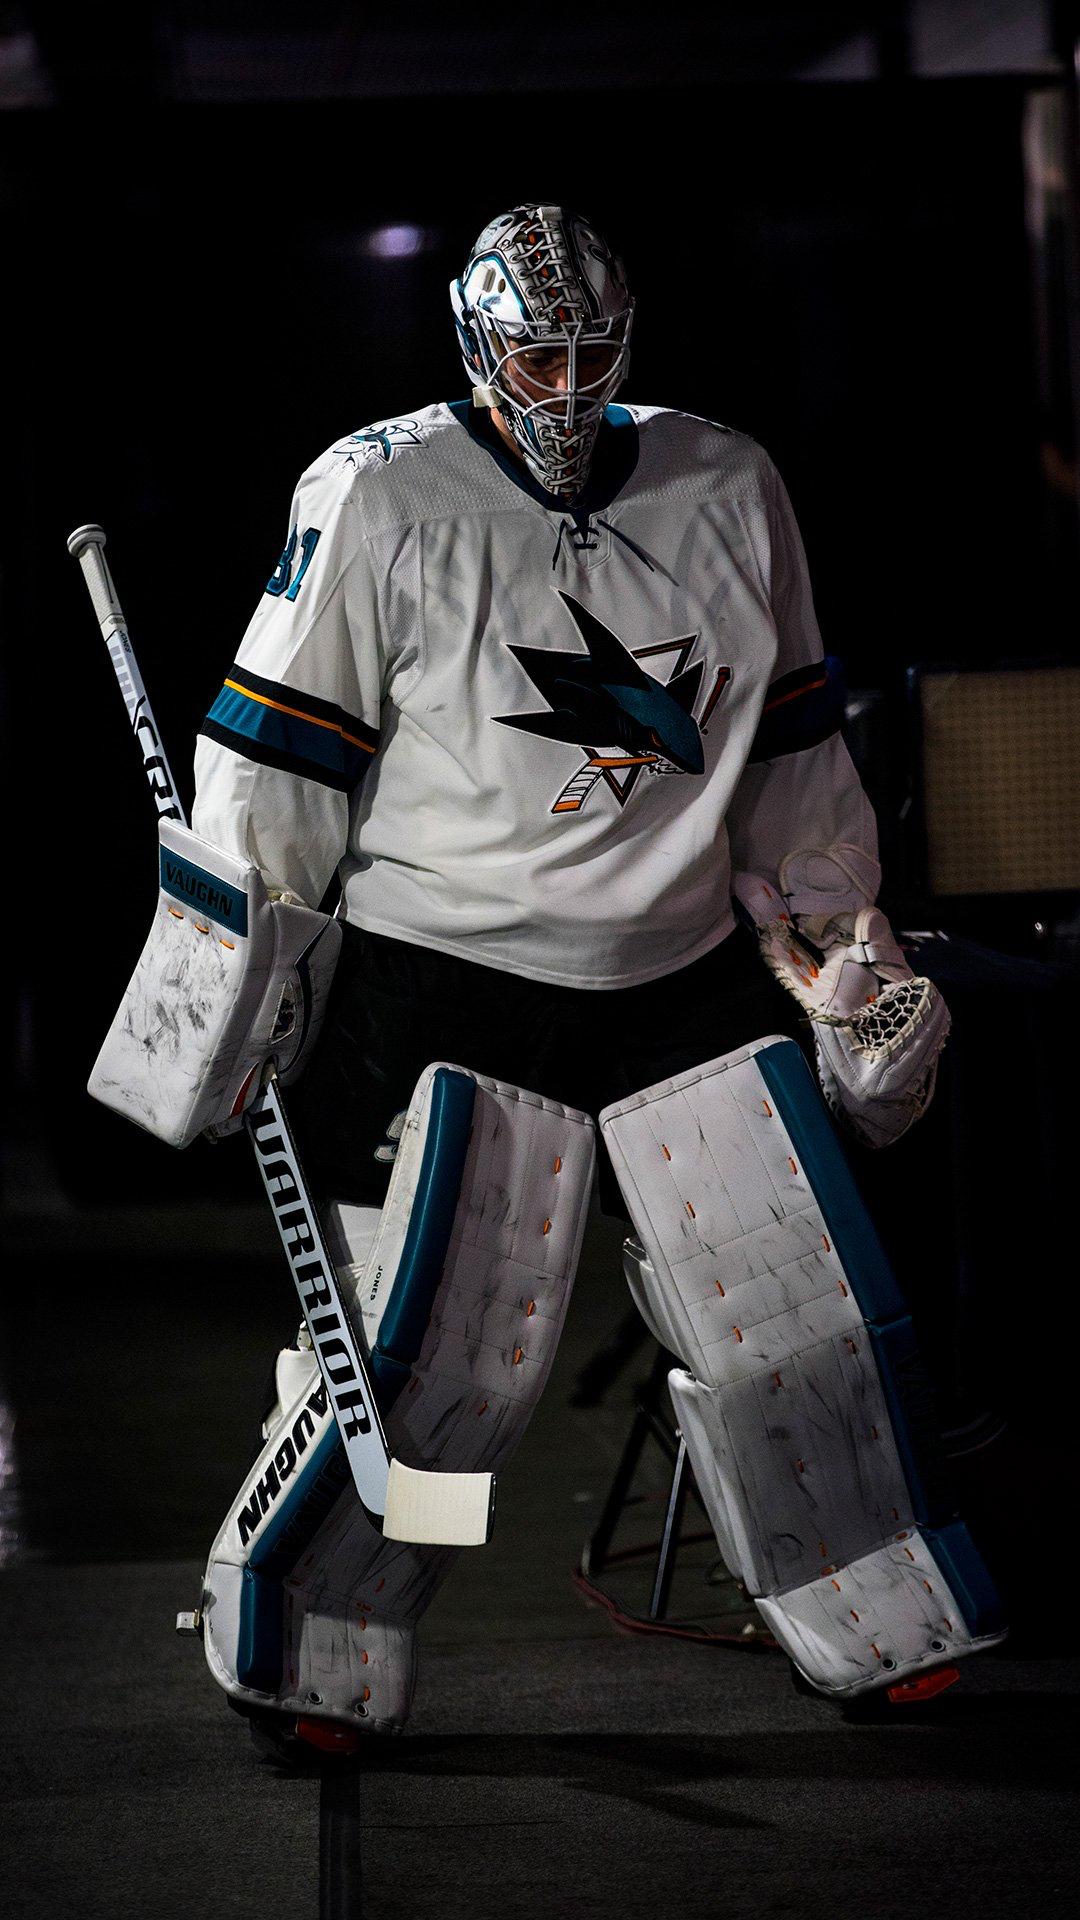 Jones Wp San Jose Sharks Hockey Goalie Goalie